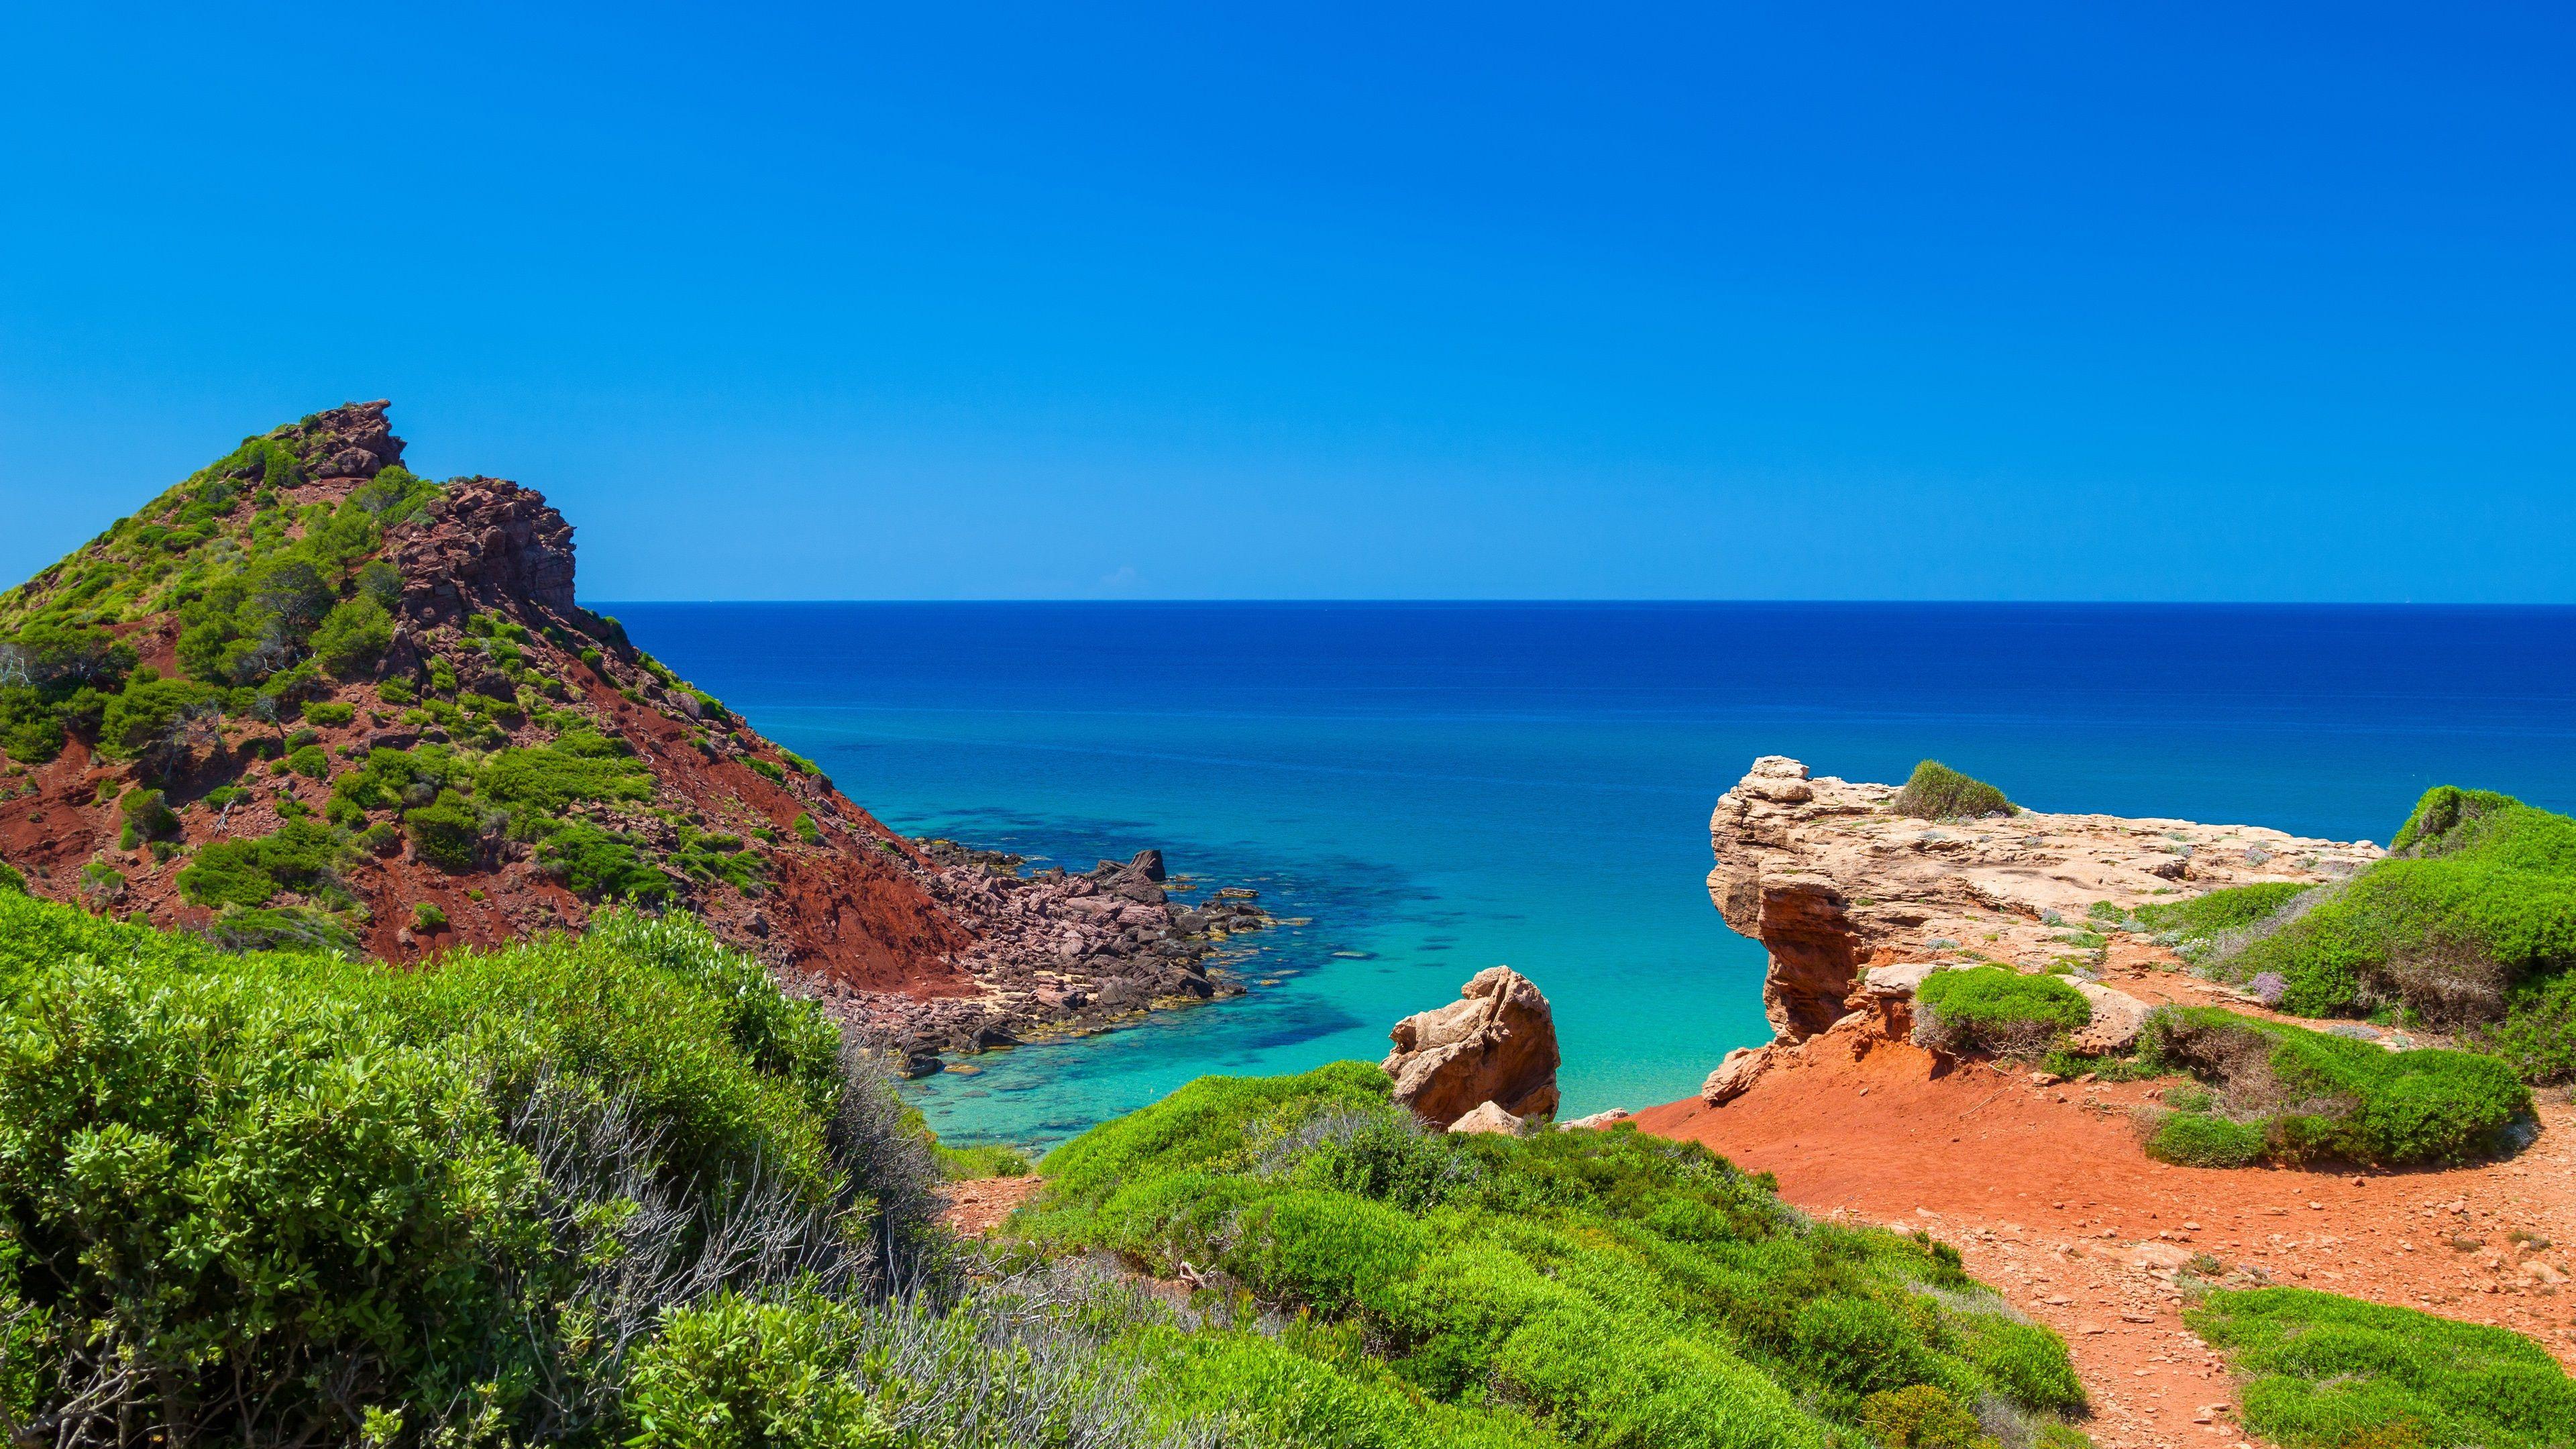 Minorque Mer Cote Ile Espagne Fonds D Ecran 3840x2160 Uhd 4k Minorque Espagne Paysage Marin